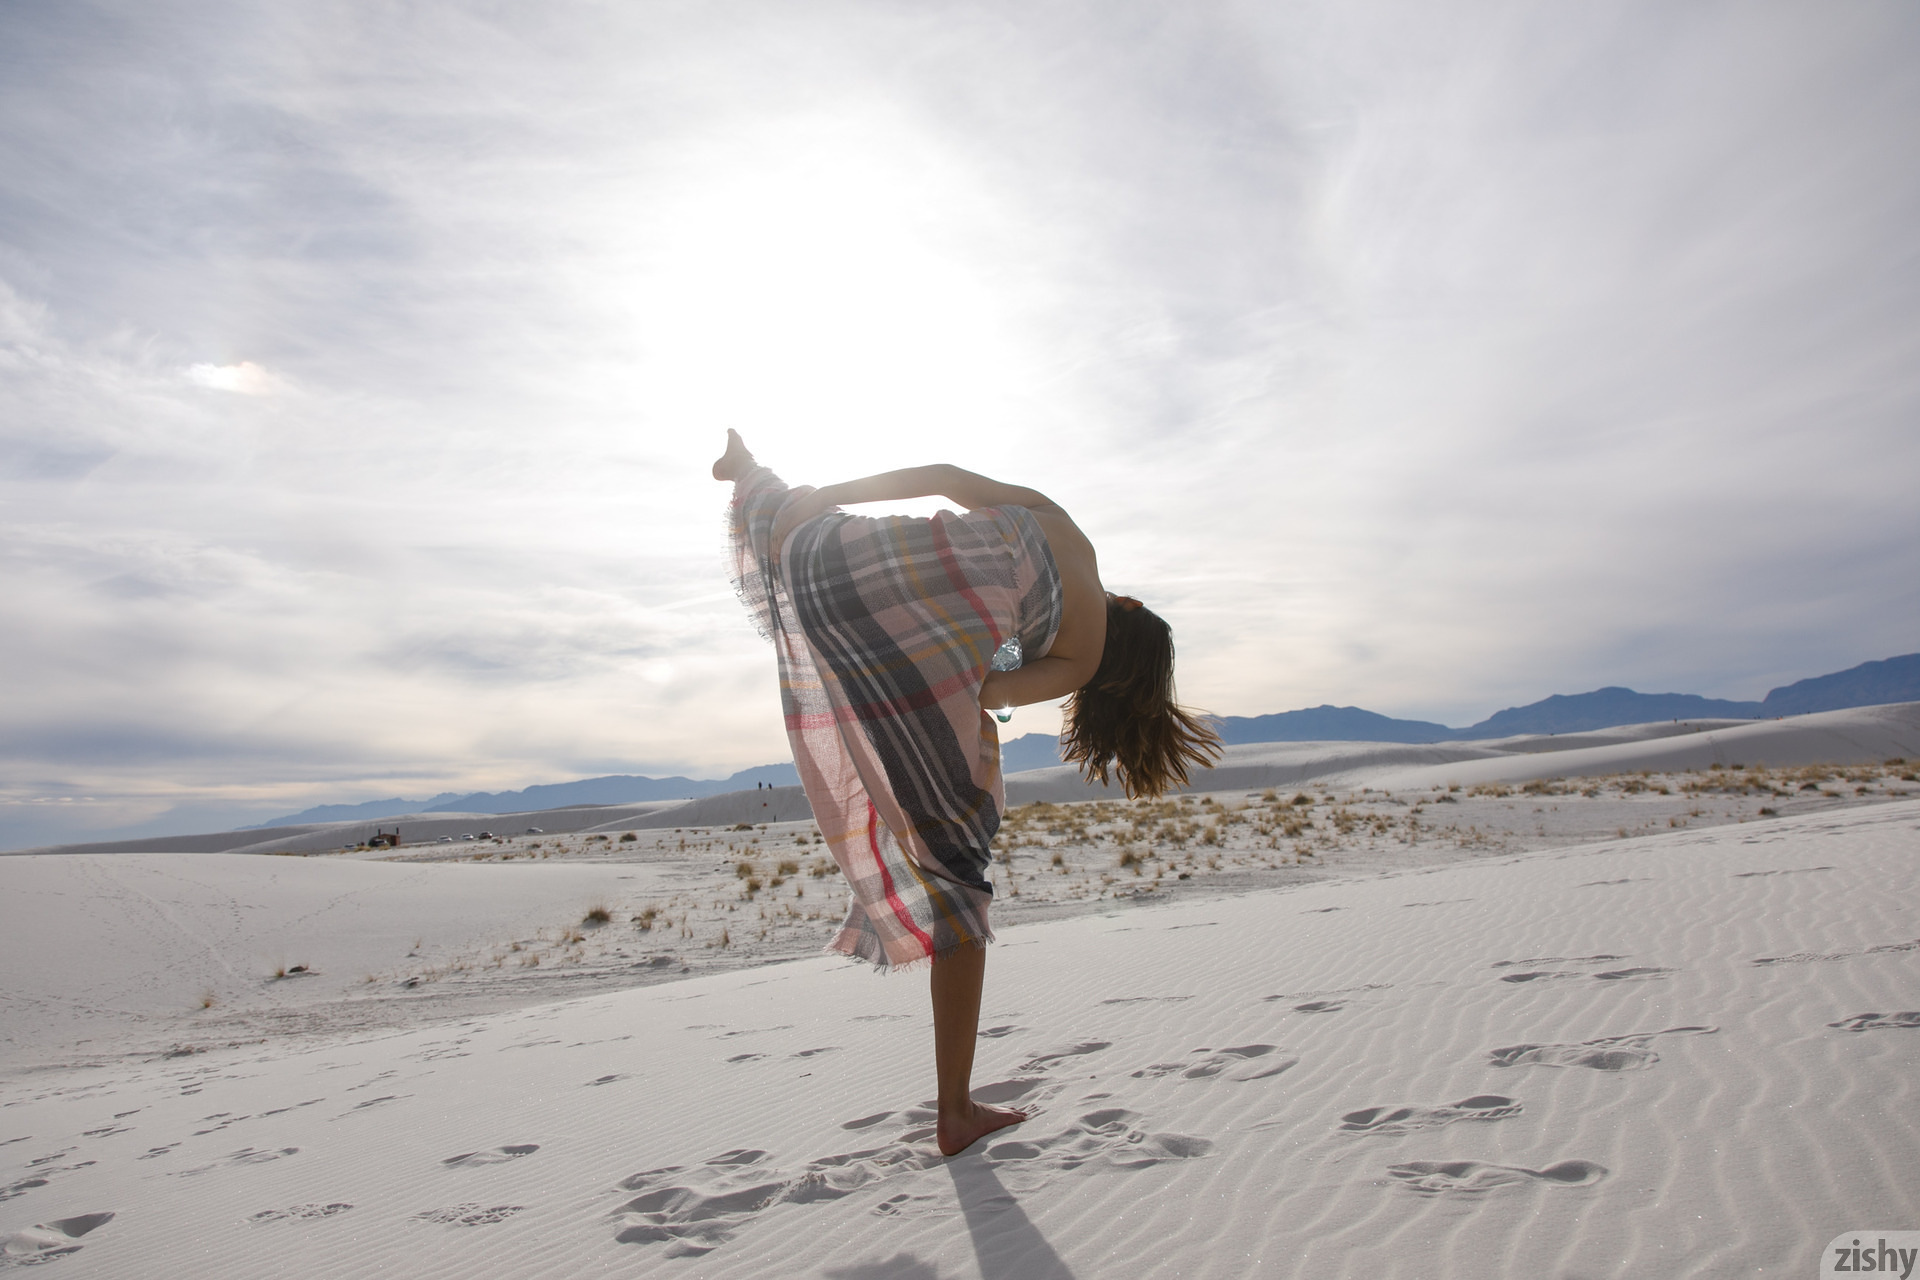 Alejandra Cobos White Sands 3 Zishy (34)